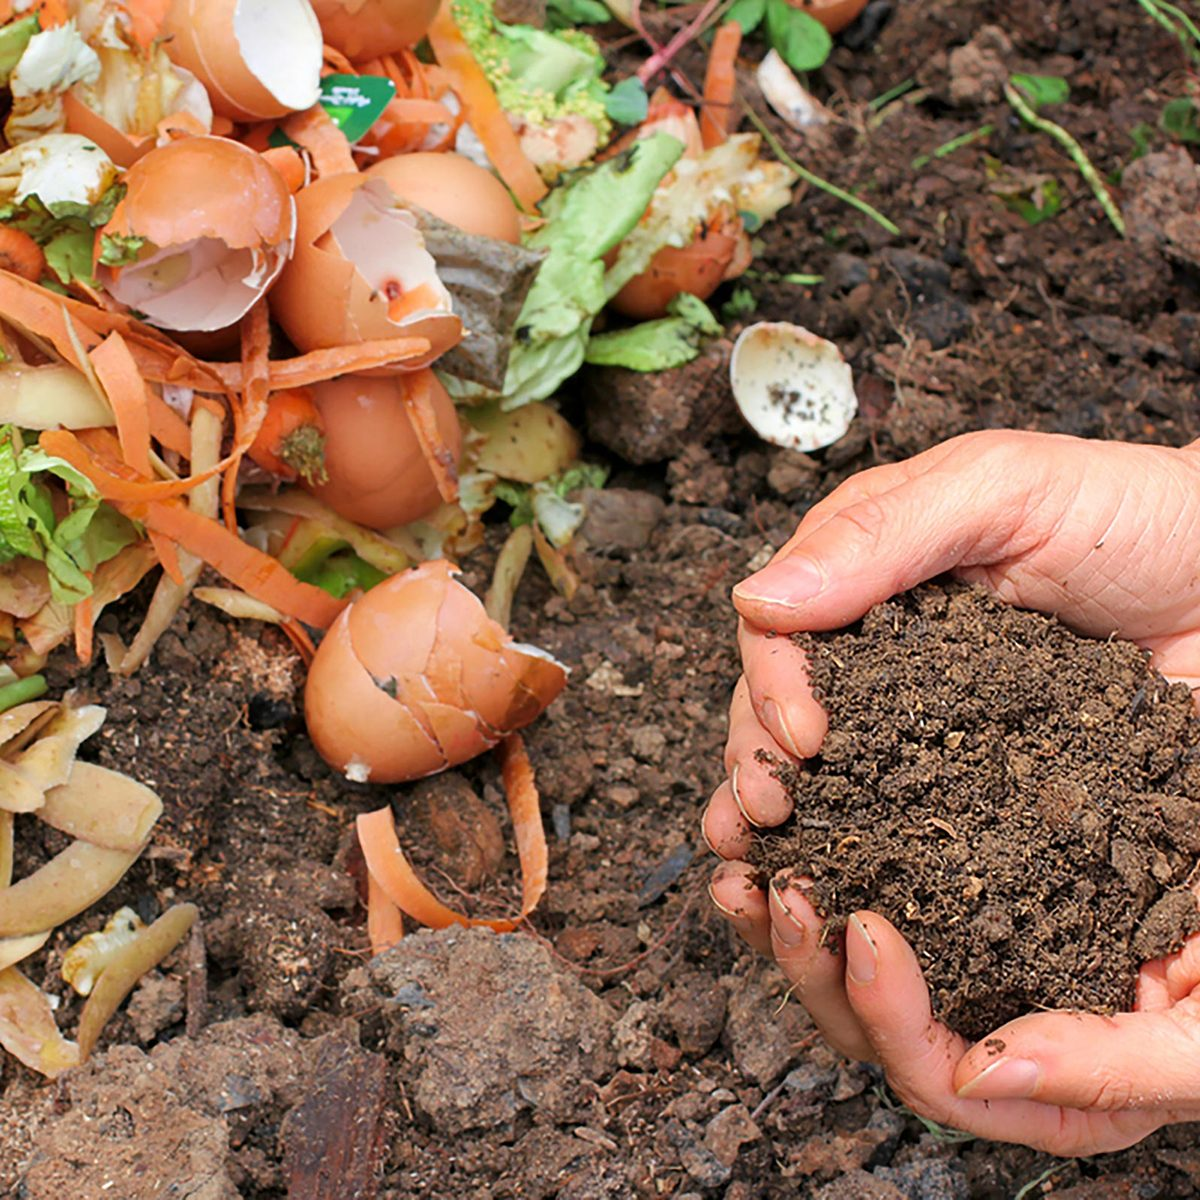 Compost - egg shells and vegetable scraps